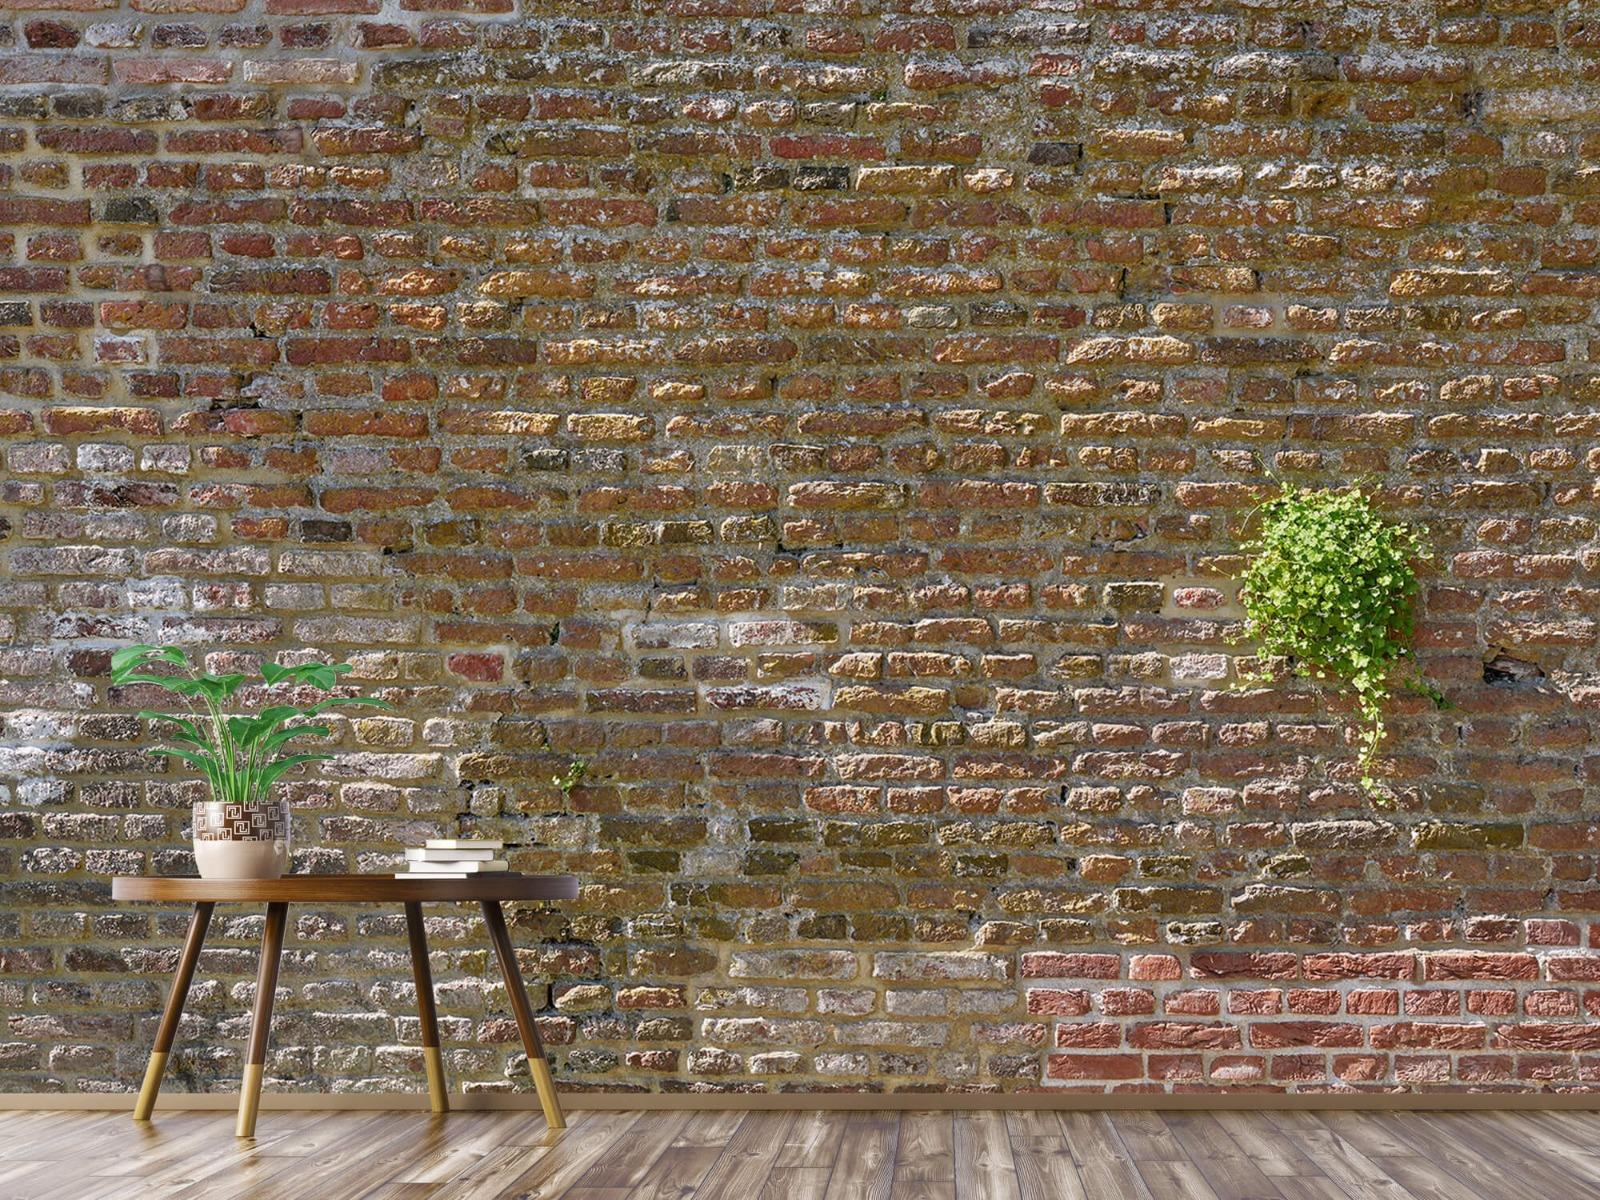 Stenen - Oude stenen stadsmuur met plantjes 5